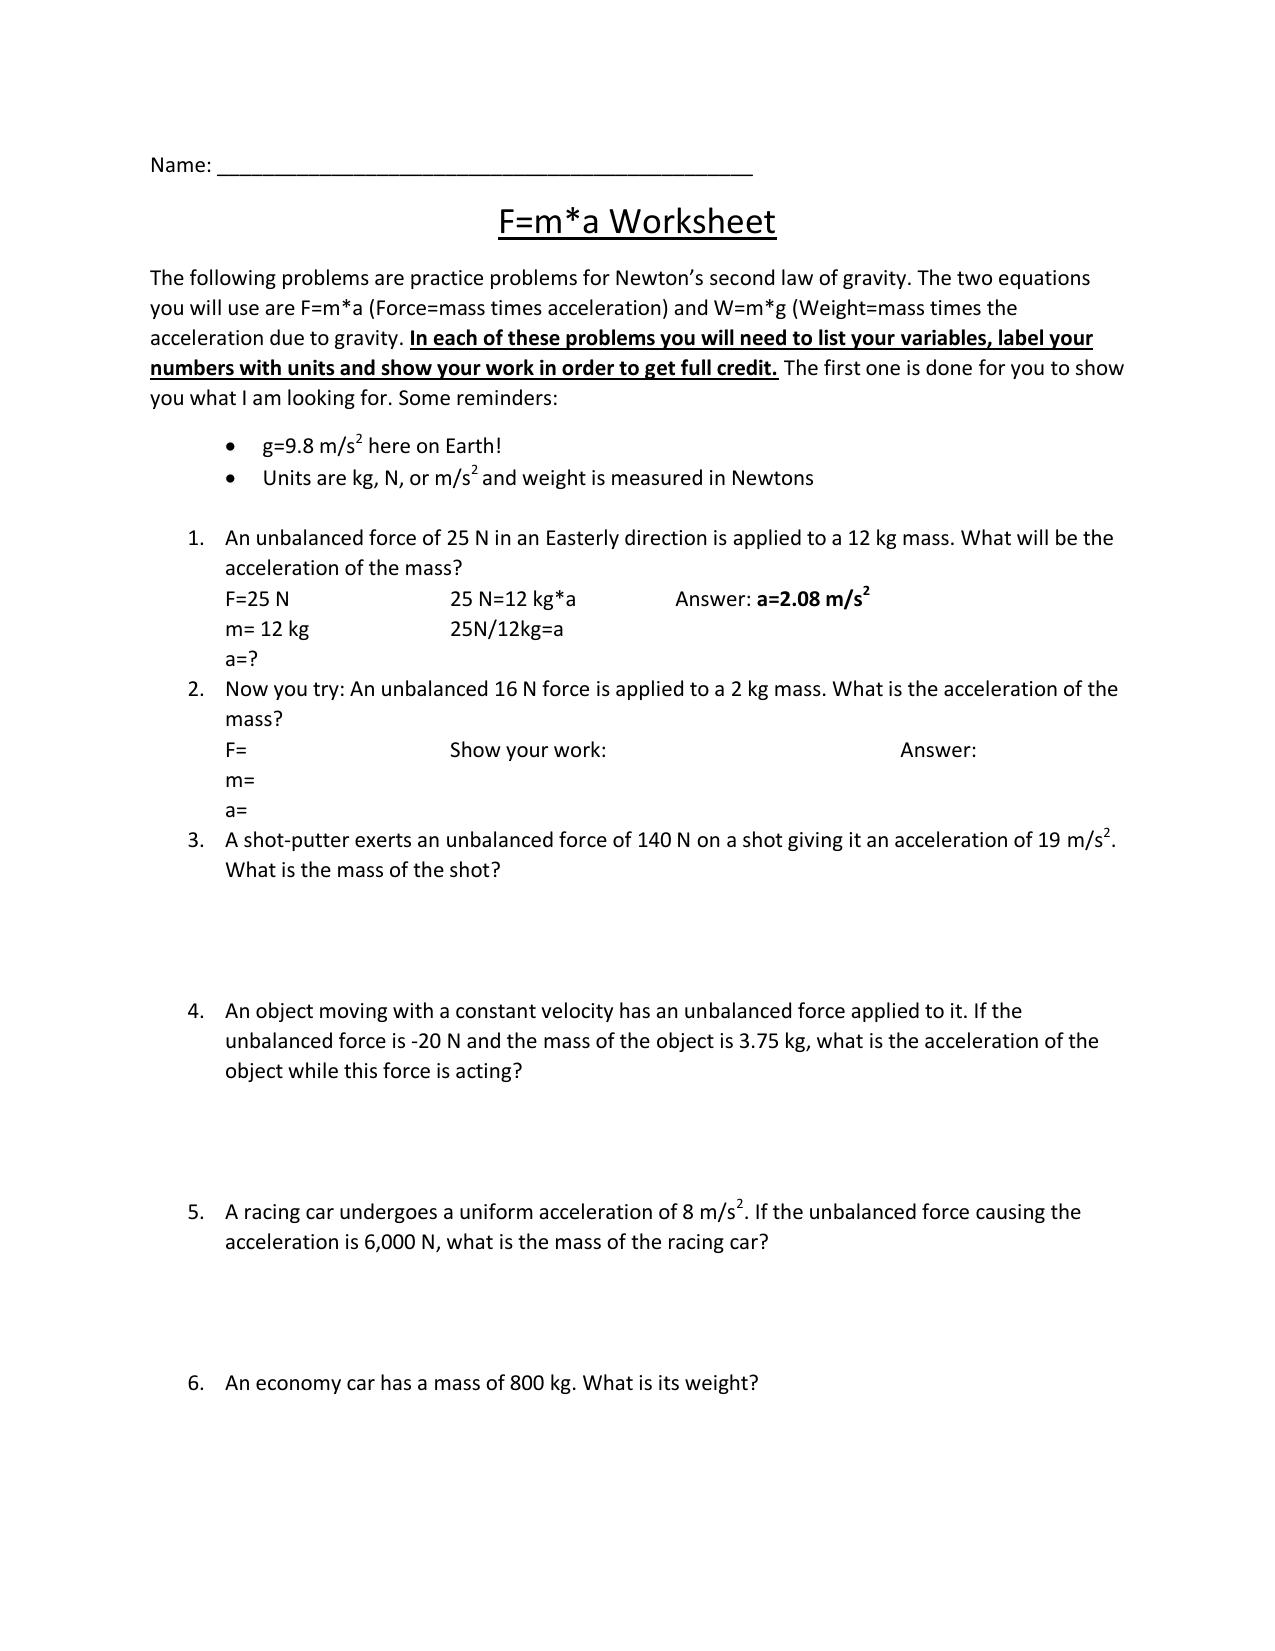 F=m*a Worksheet